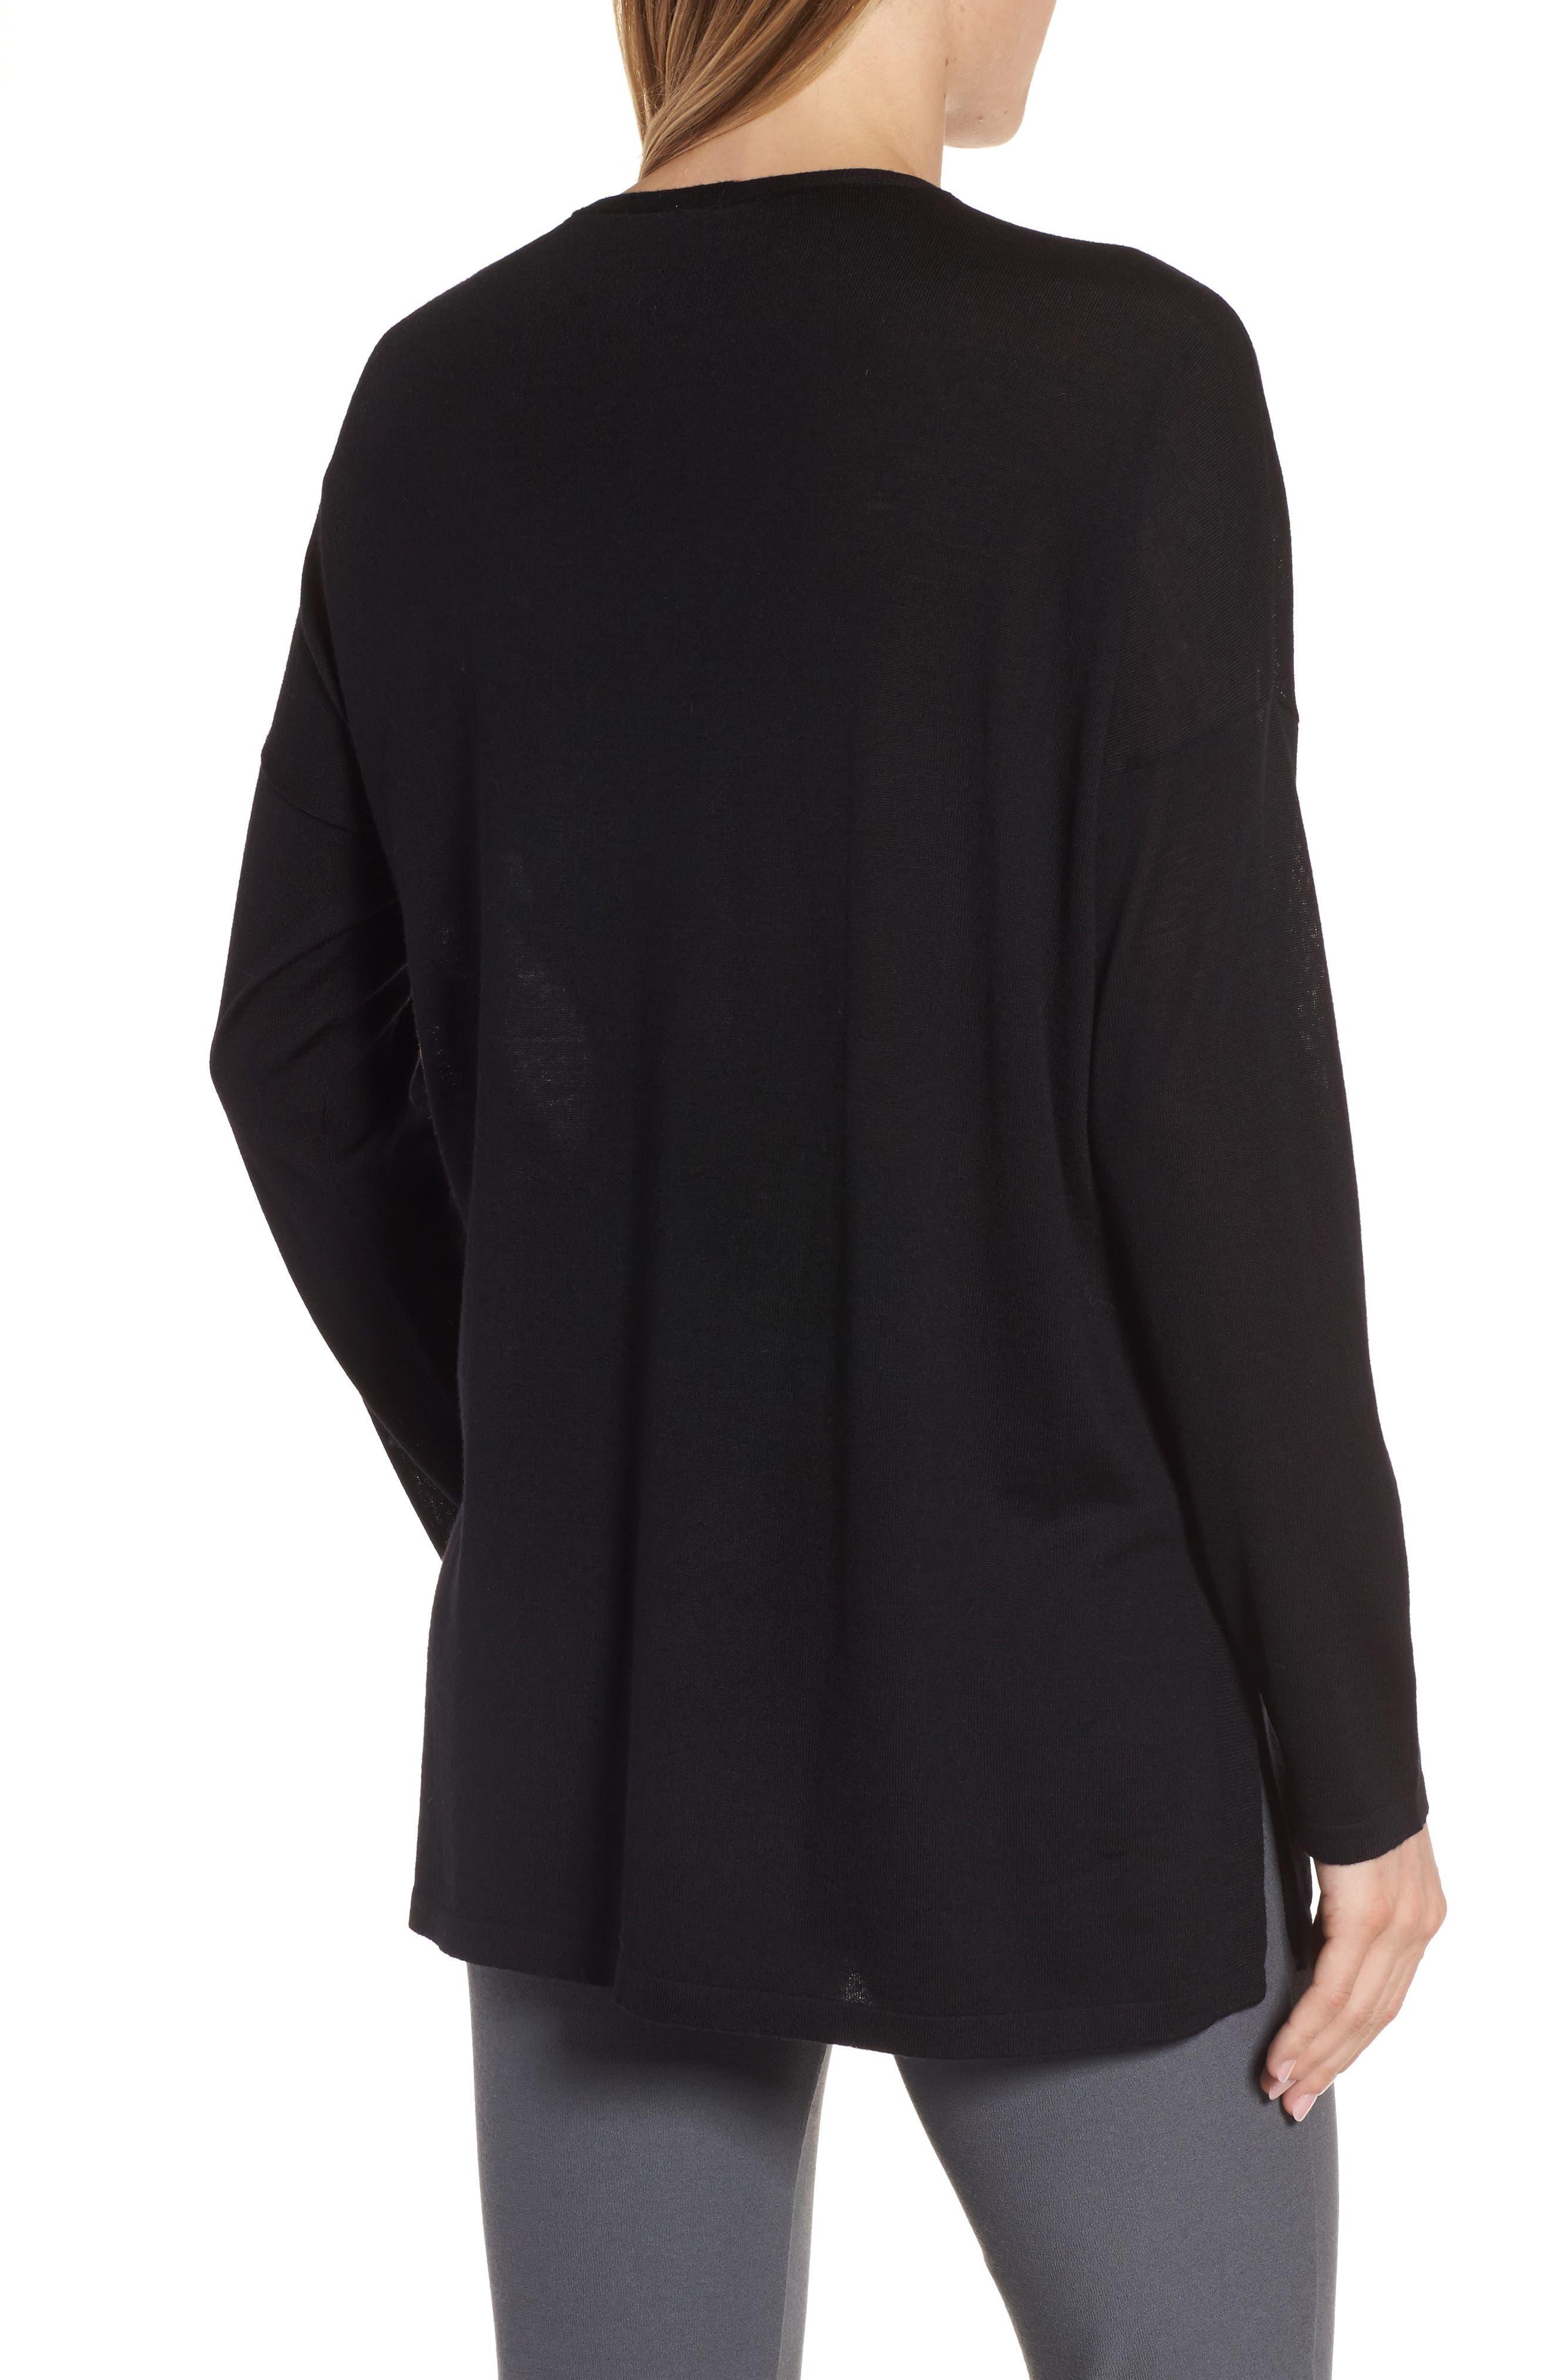 Merino Wool Tunic Sweater,                             Alternate thumbnail 2, color,                             001